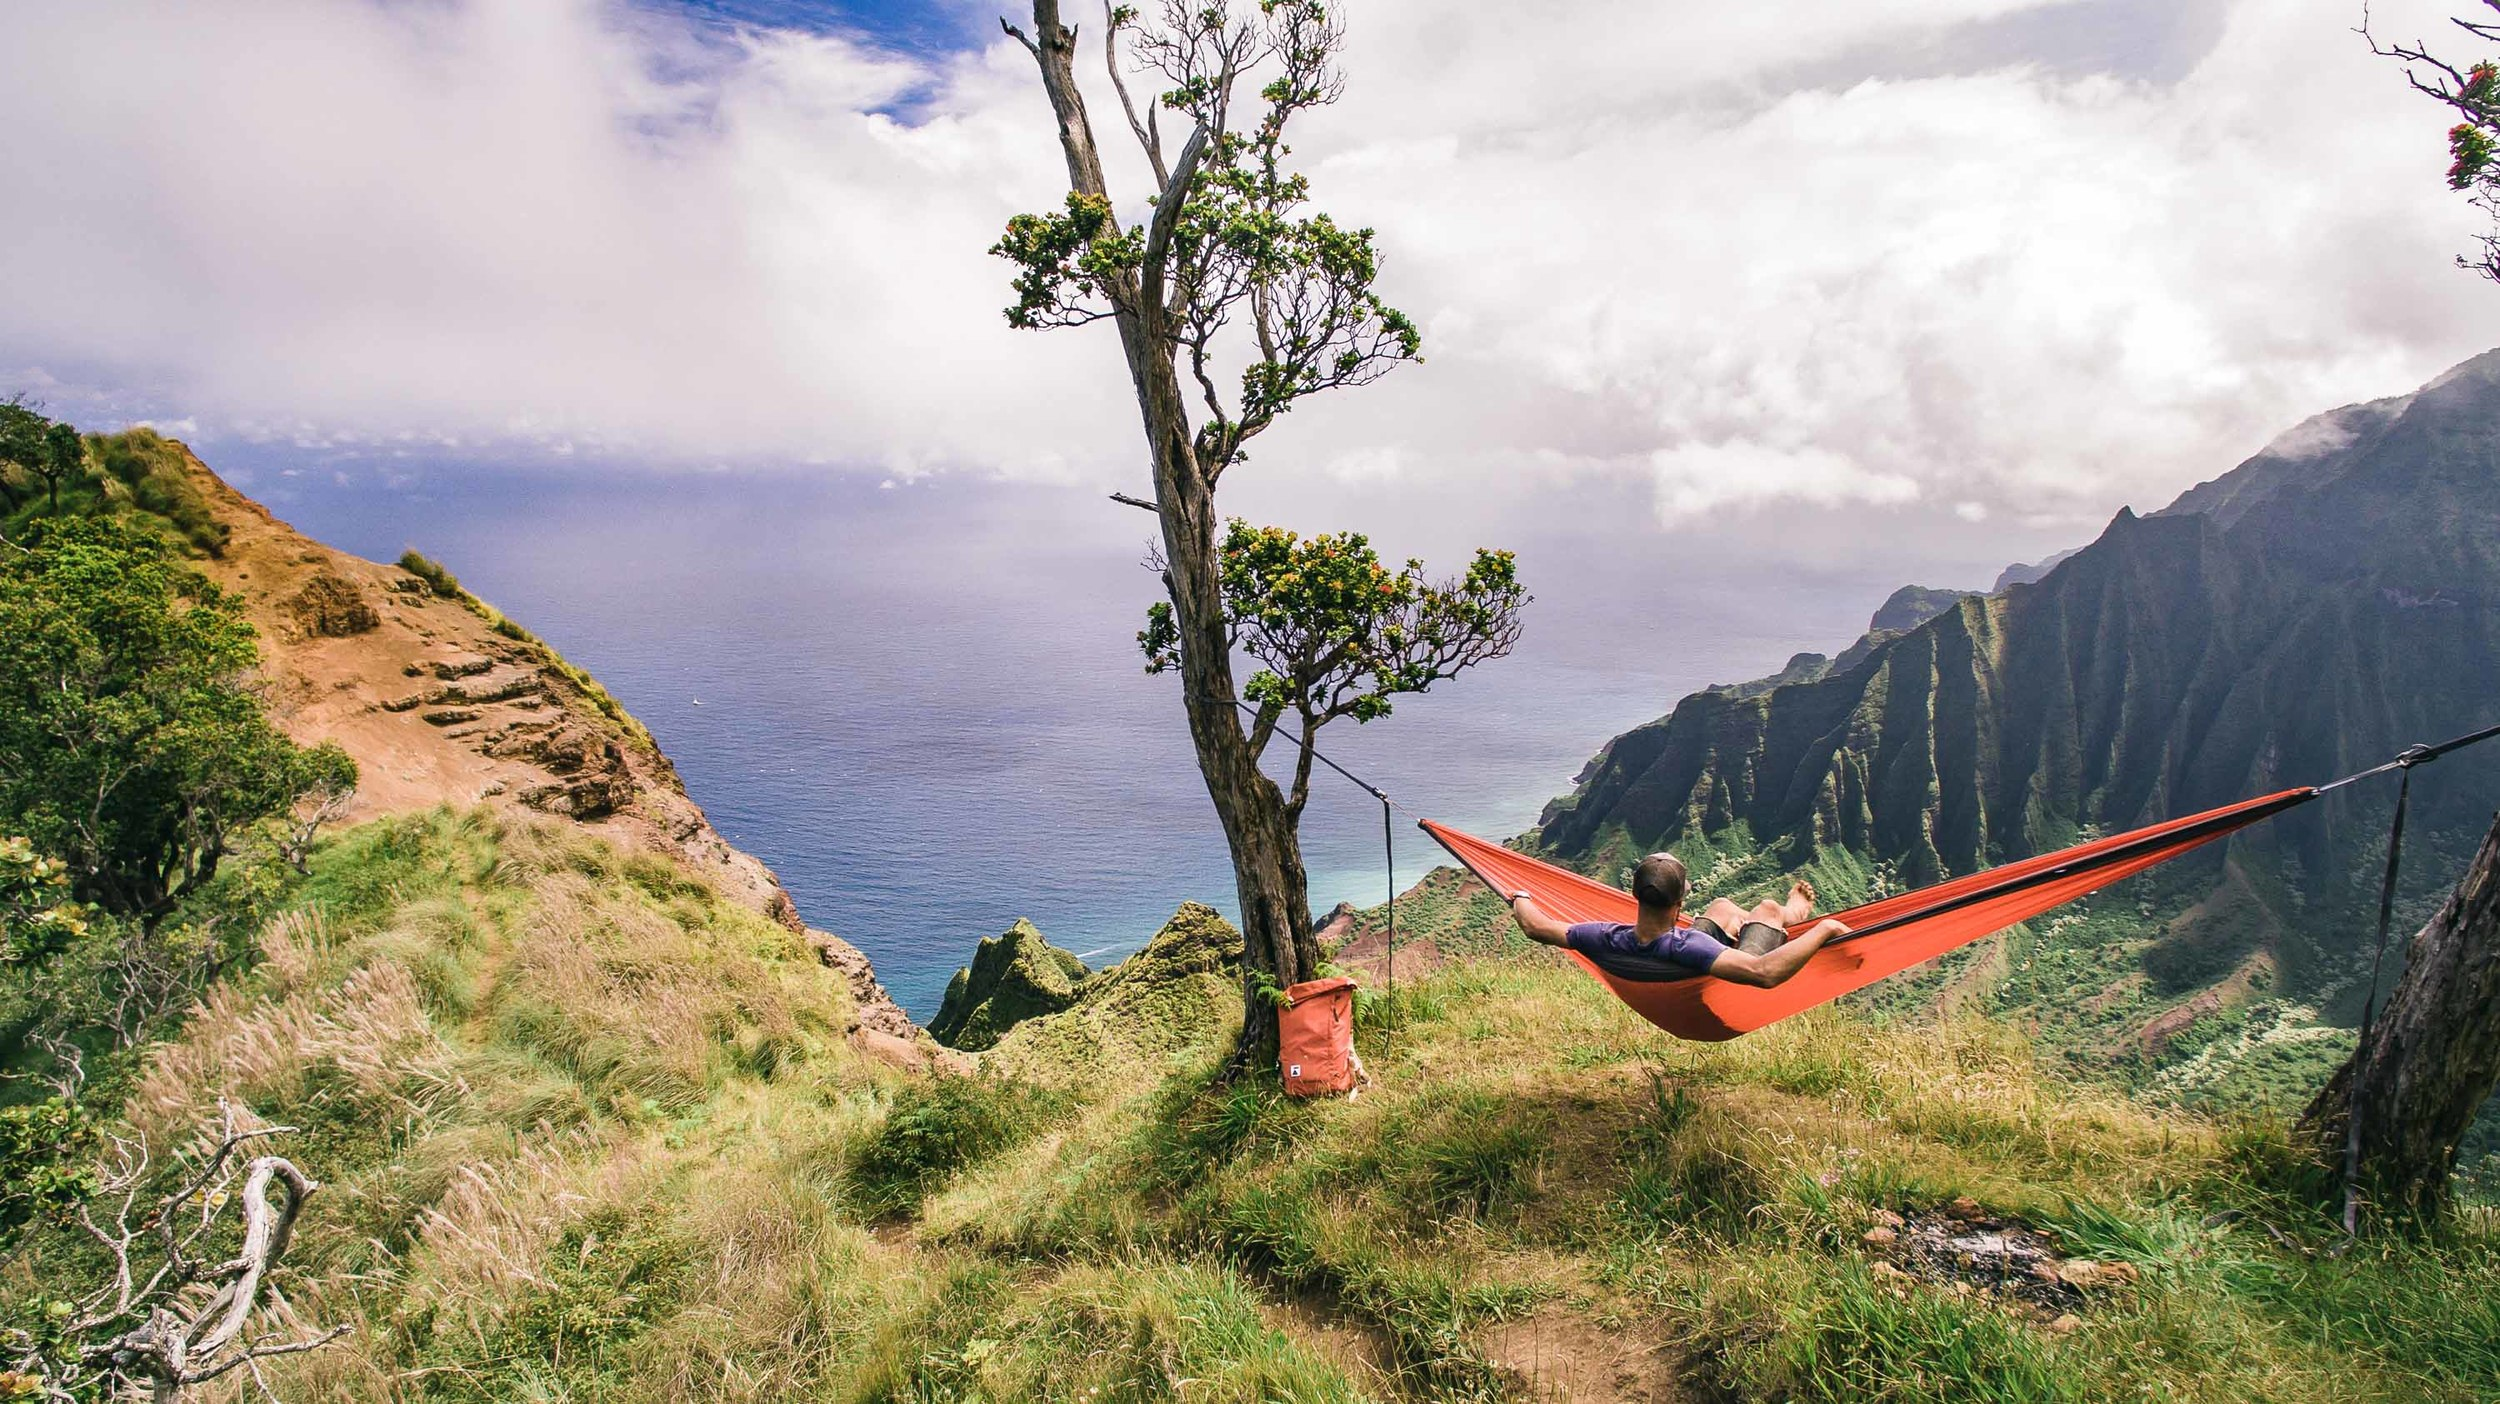 bryce-johnson-kalalau-ridge-kauai-hiking-hammock-palmwood-aloha-exchange-22.jpg